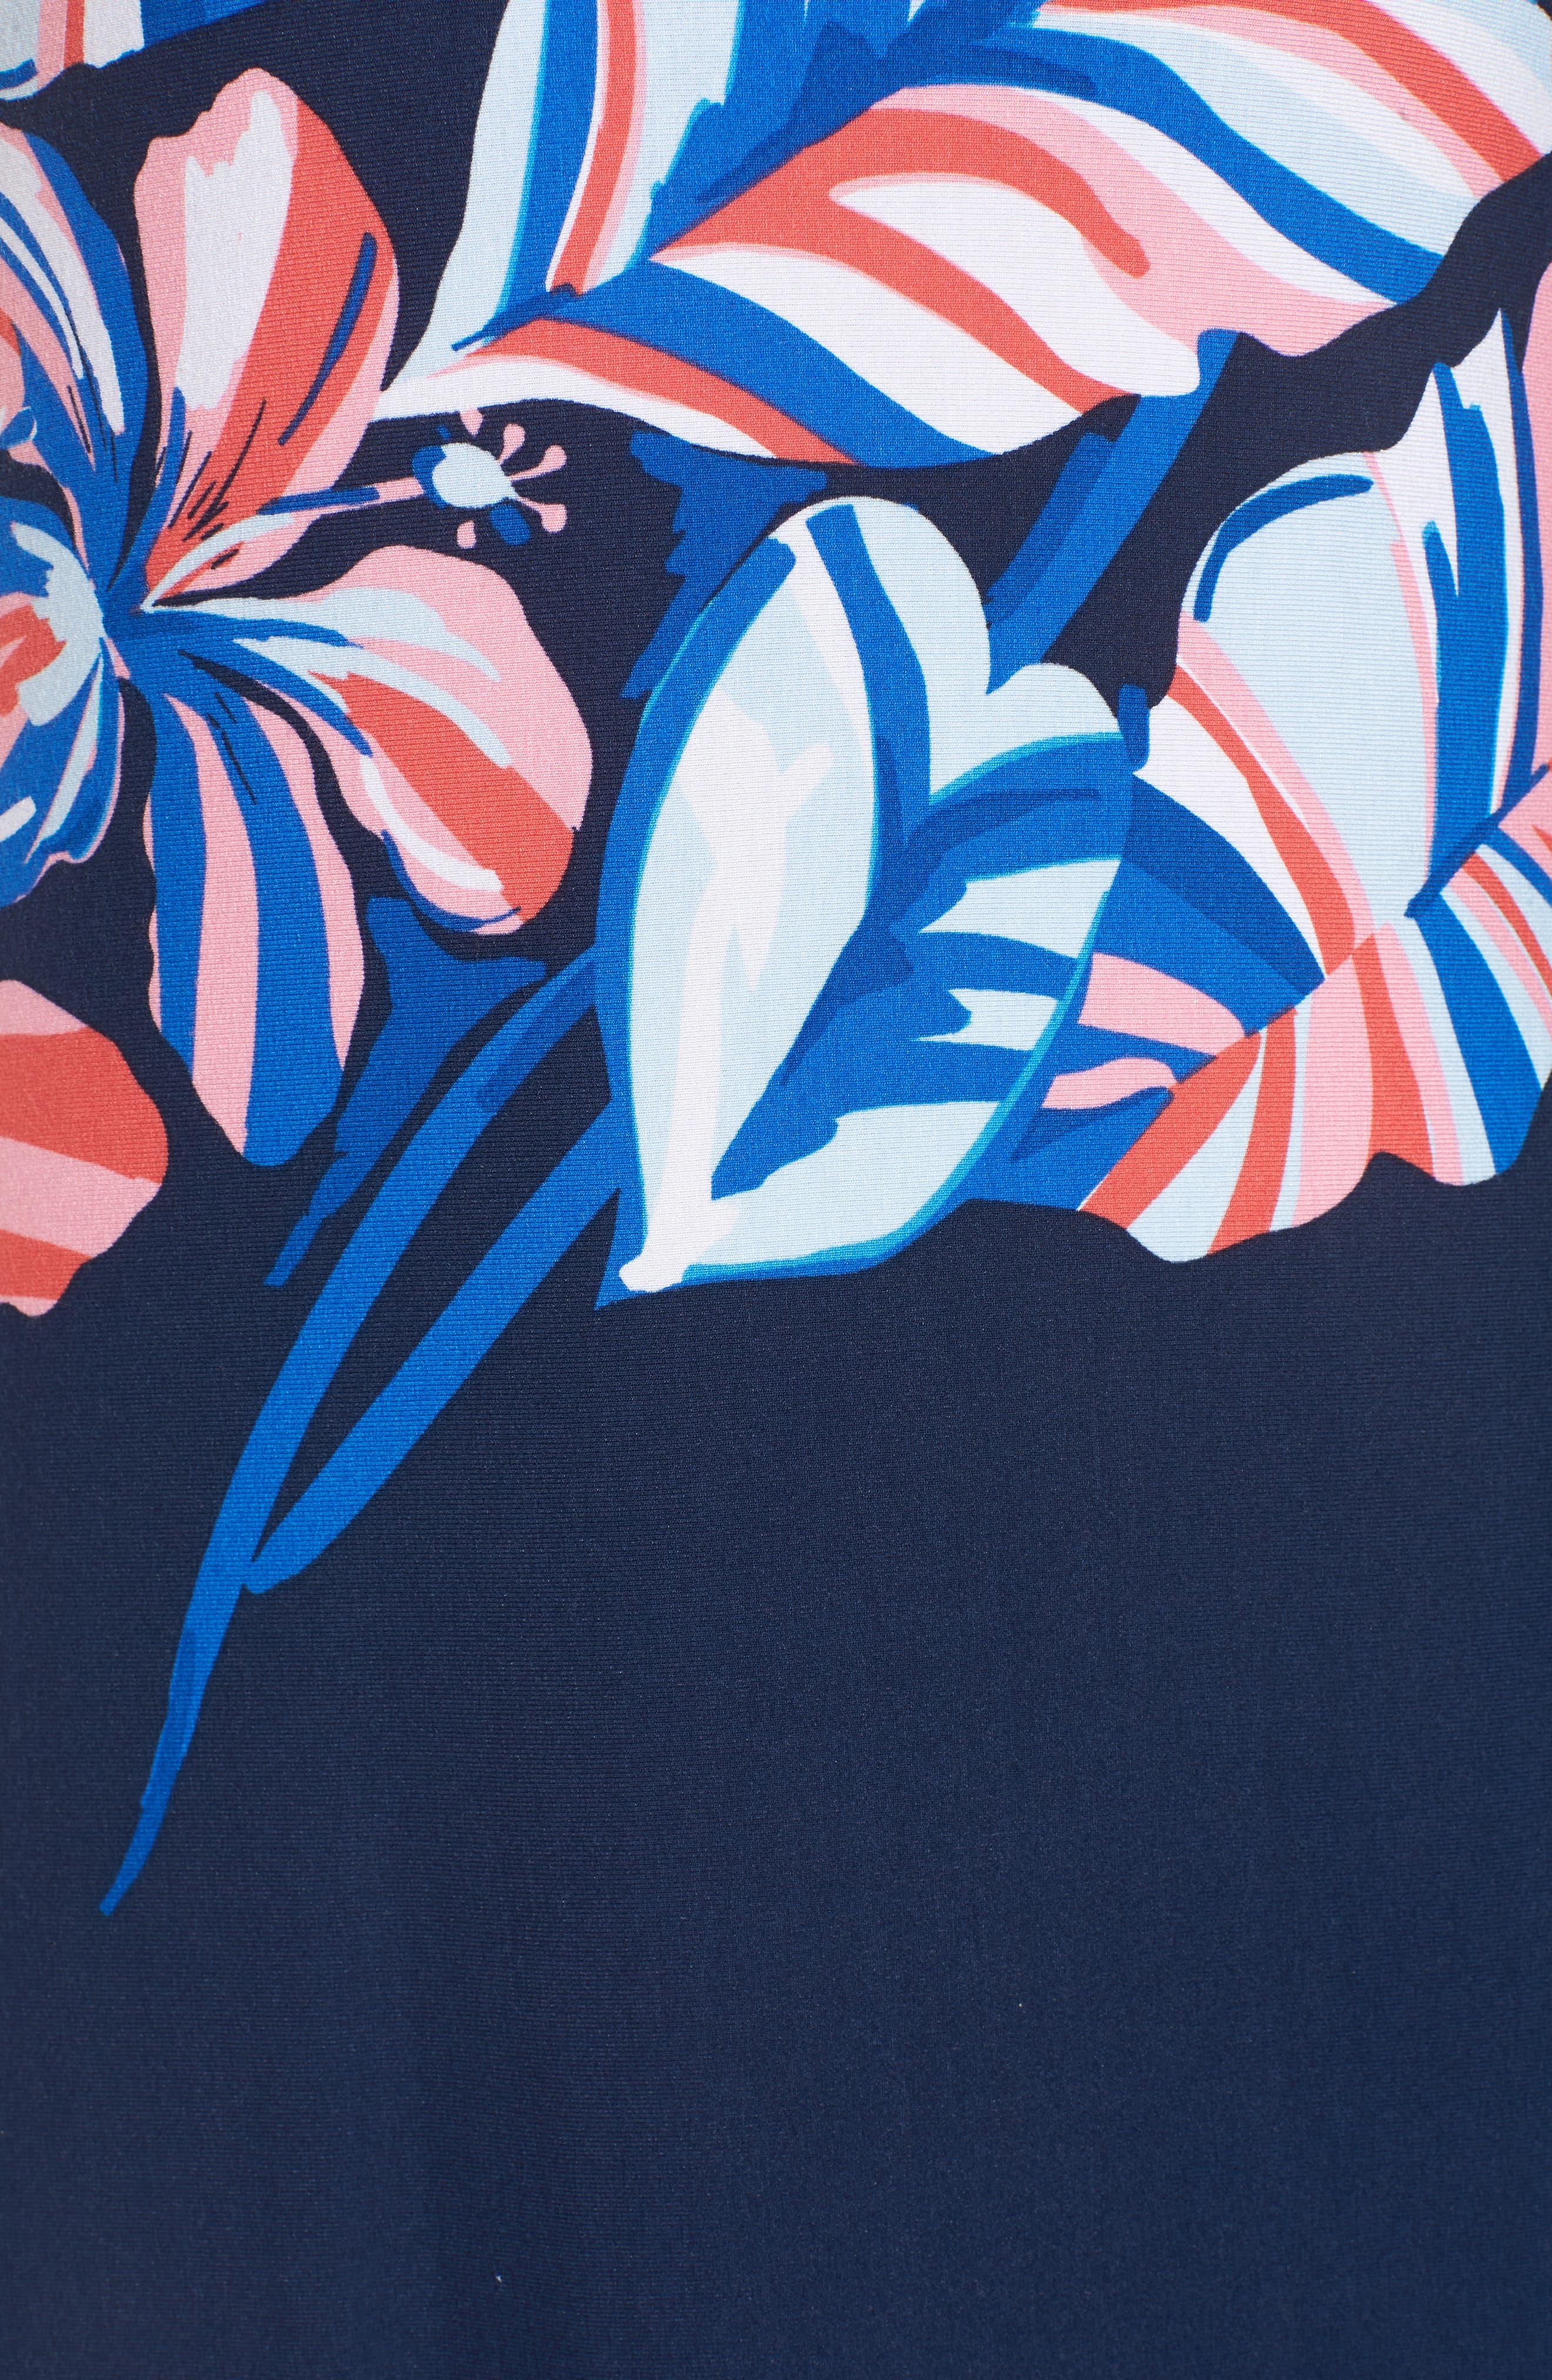 Le Tigre Floral Maxi Dress,                             Alternate thumbnail 6, color,                             Ocean Deep